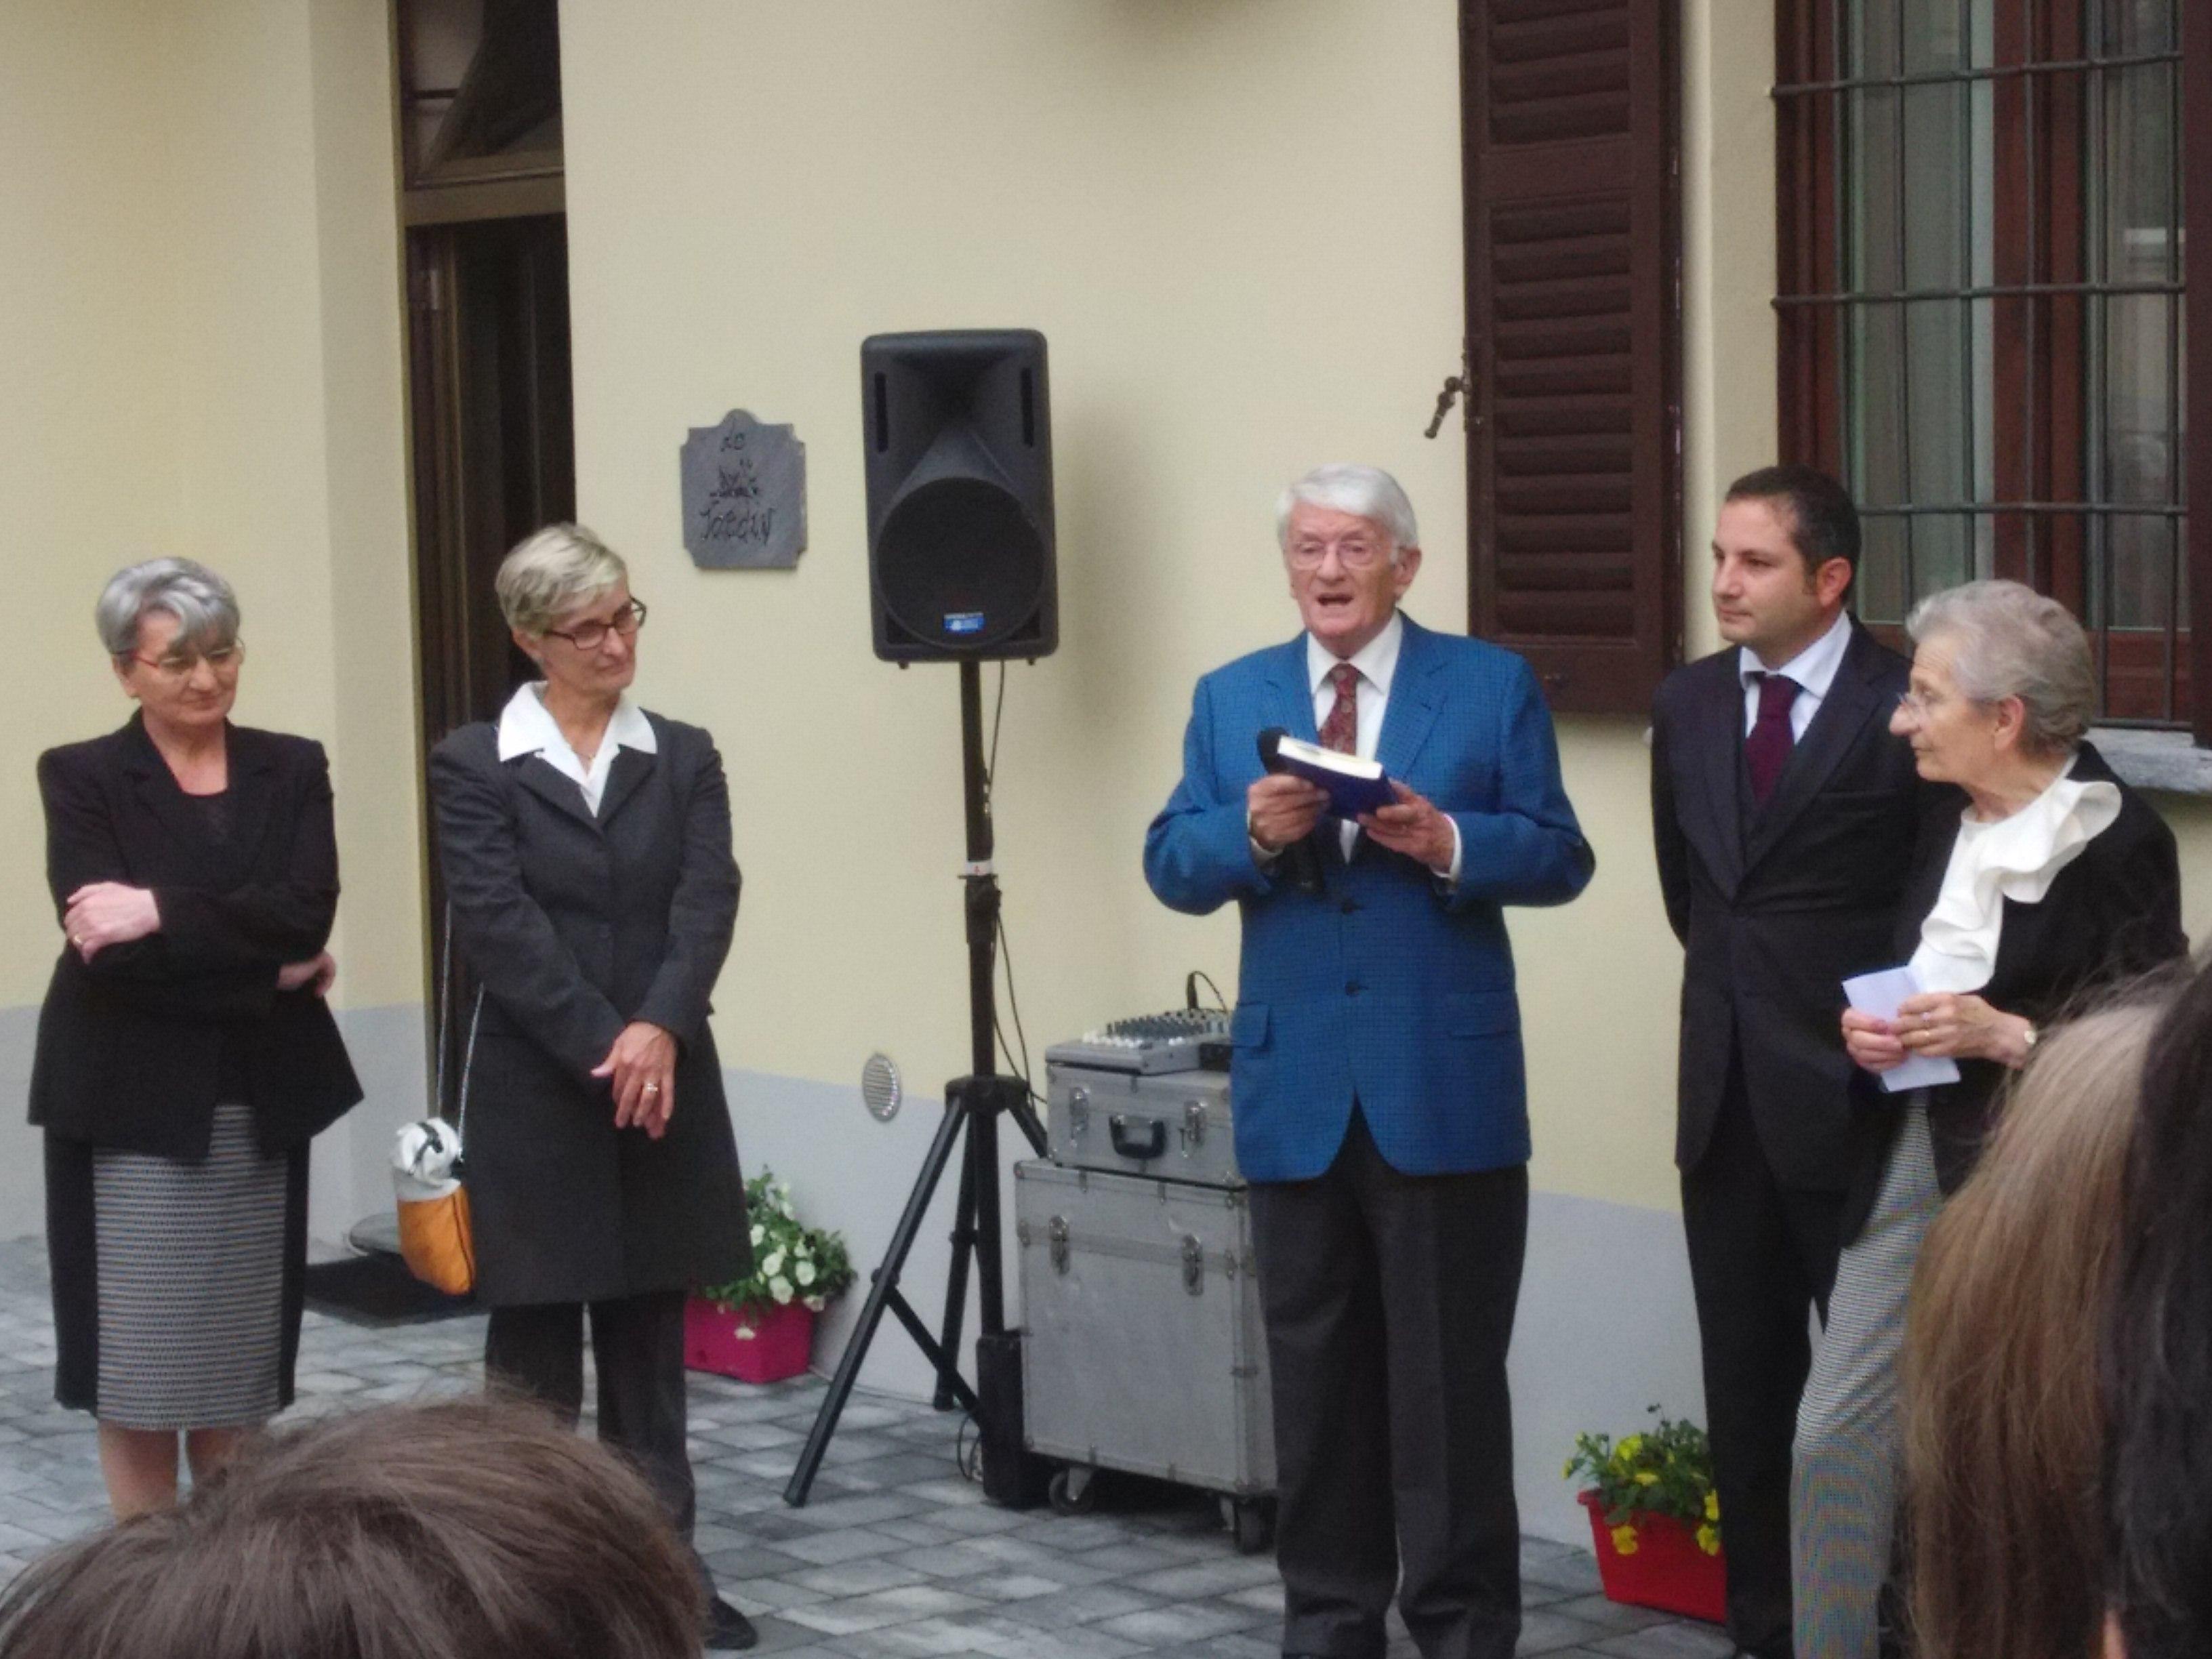 Inaugurazione a Nova Milanese de La casa di Margit